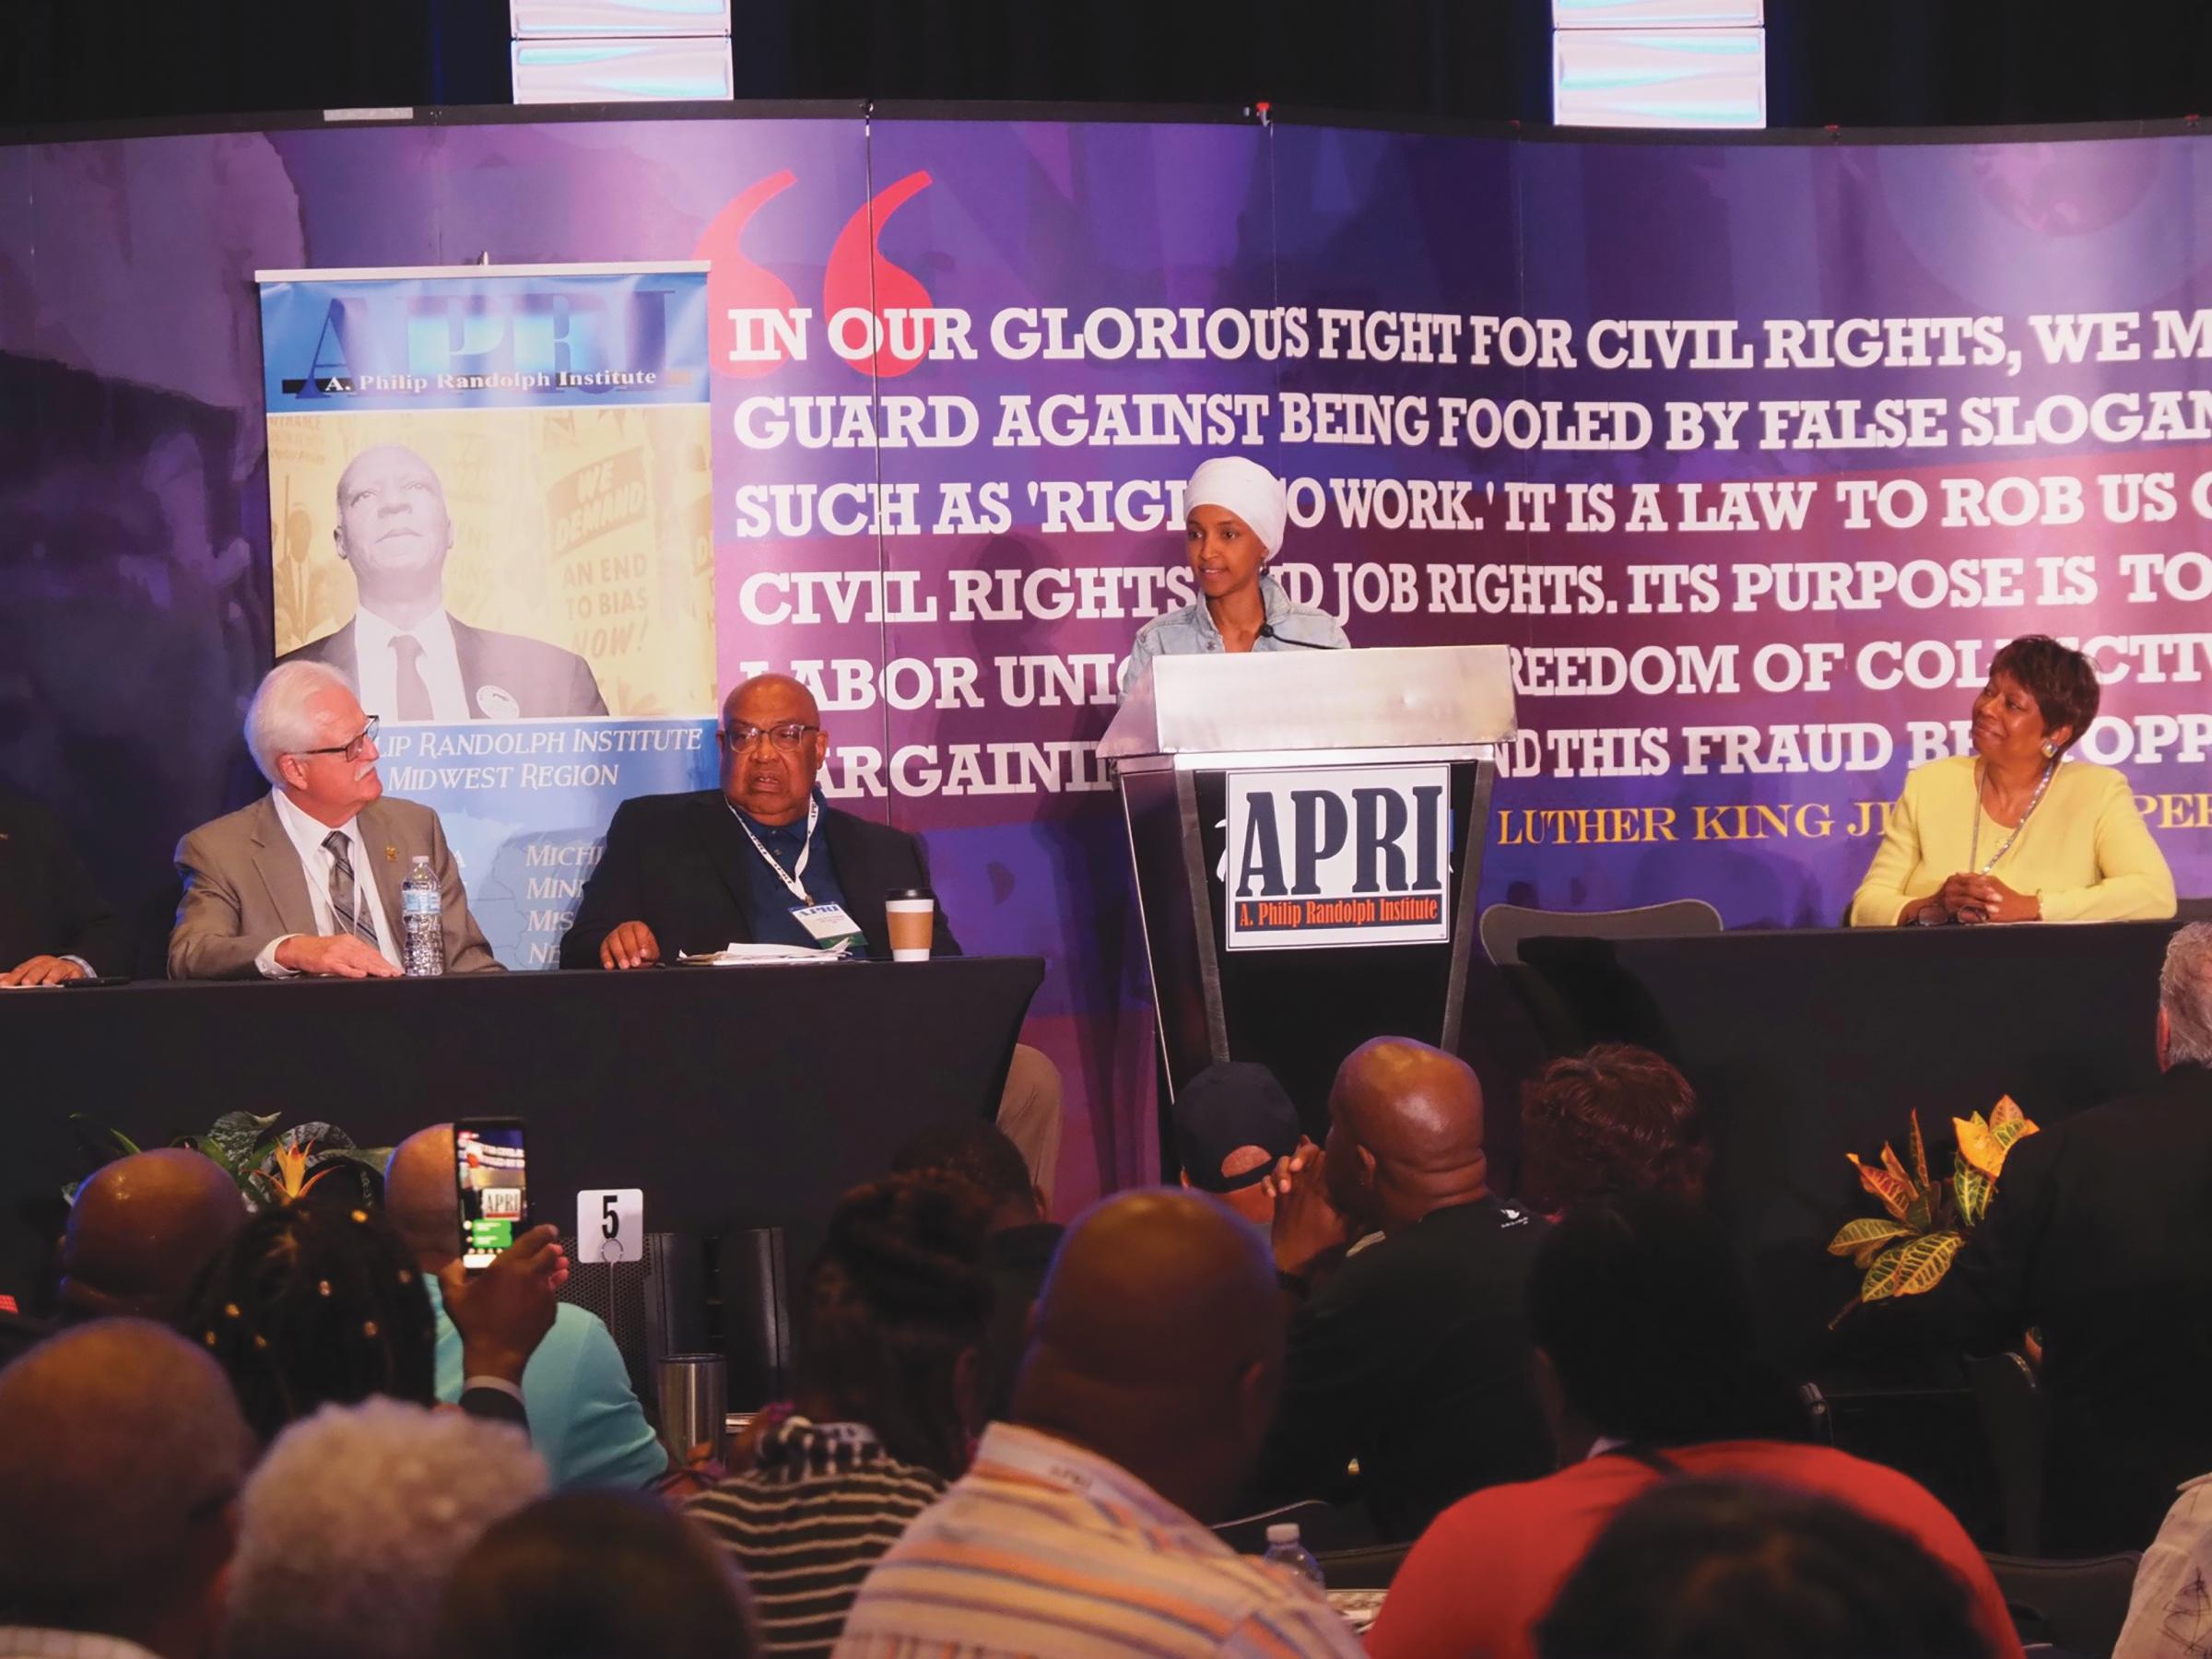 Congresswoman Ilhan Omar (D-MN) (Photo Credit: Jon Levine, APRI)